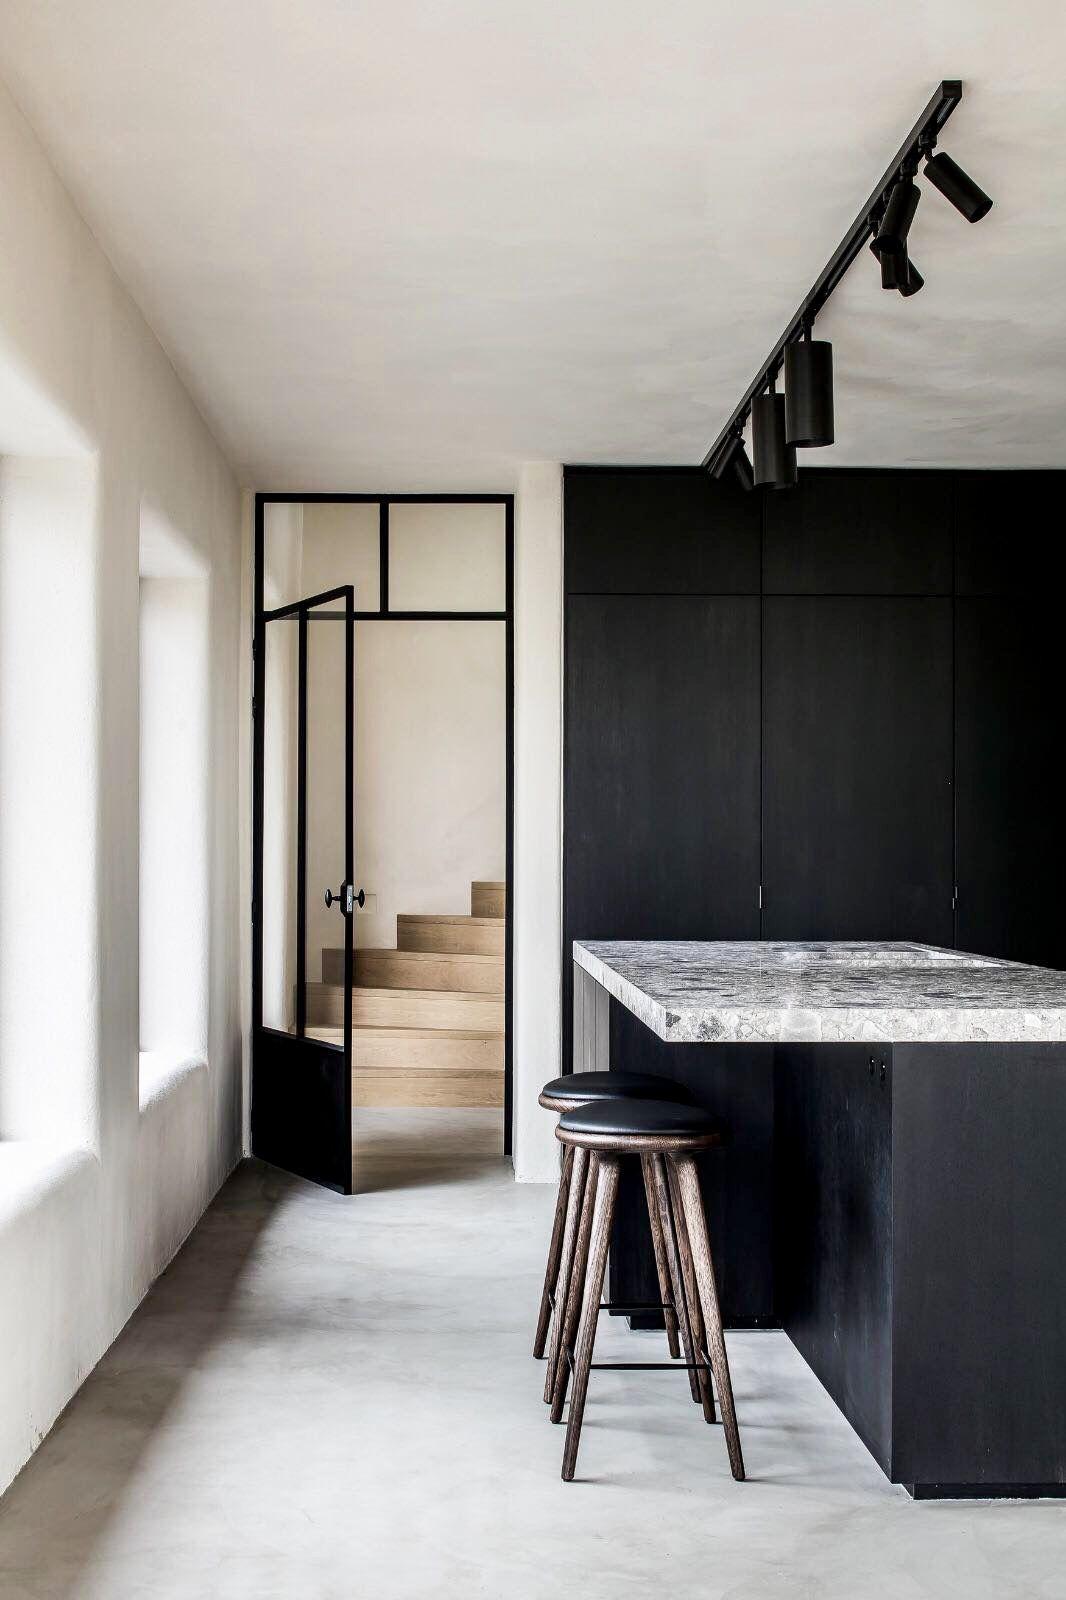 Pin by Simon Overmeyer on JosefEnd | Pinterest | Interiors, Kitchens ...